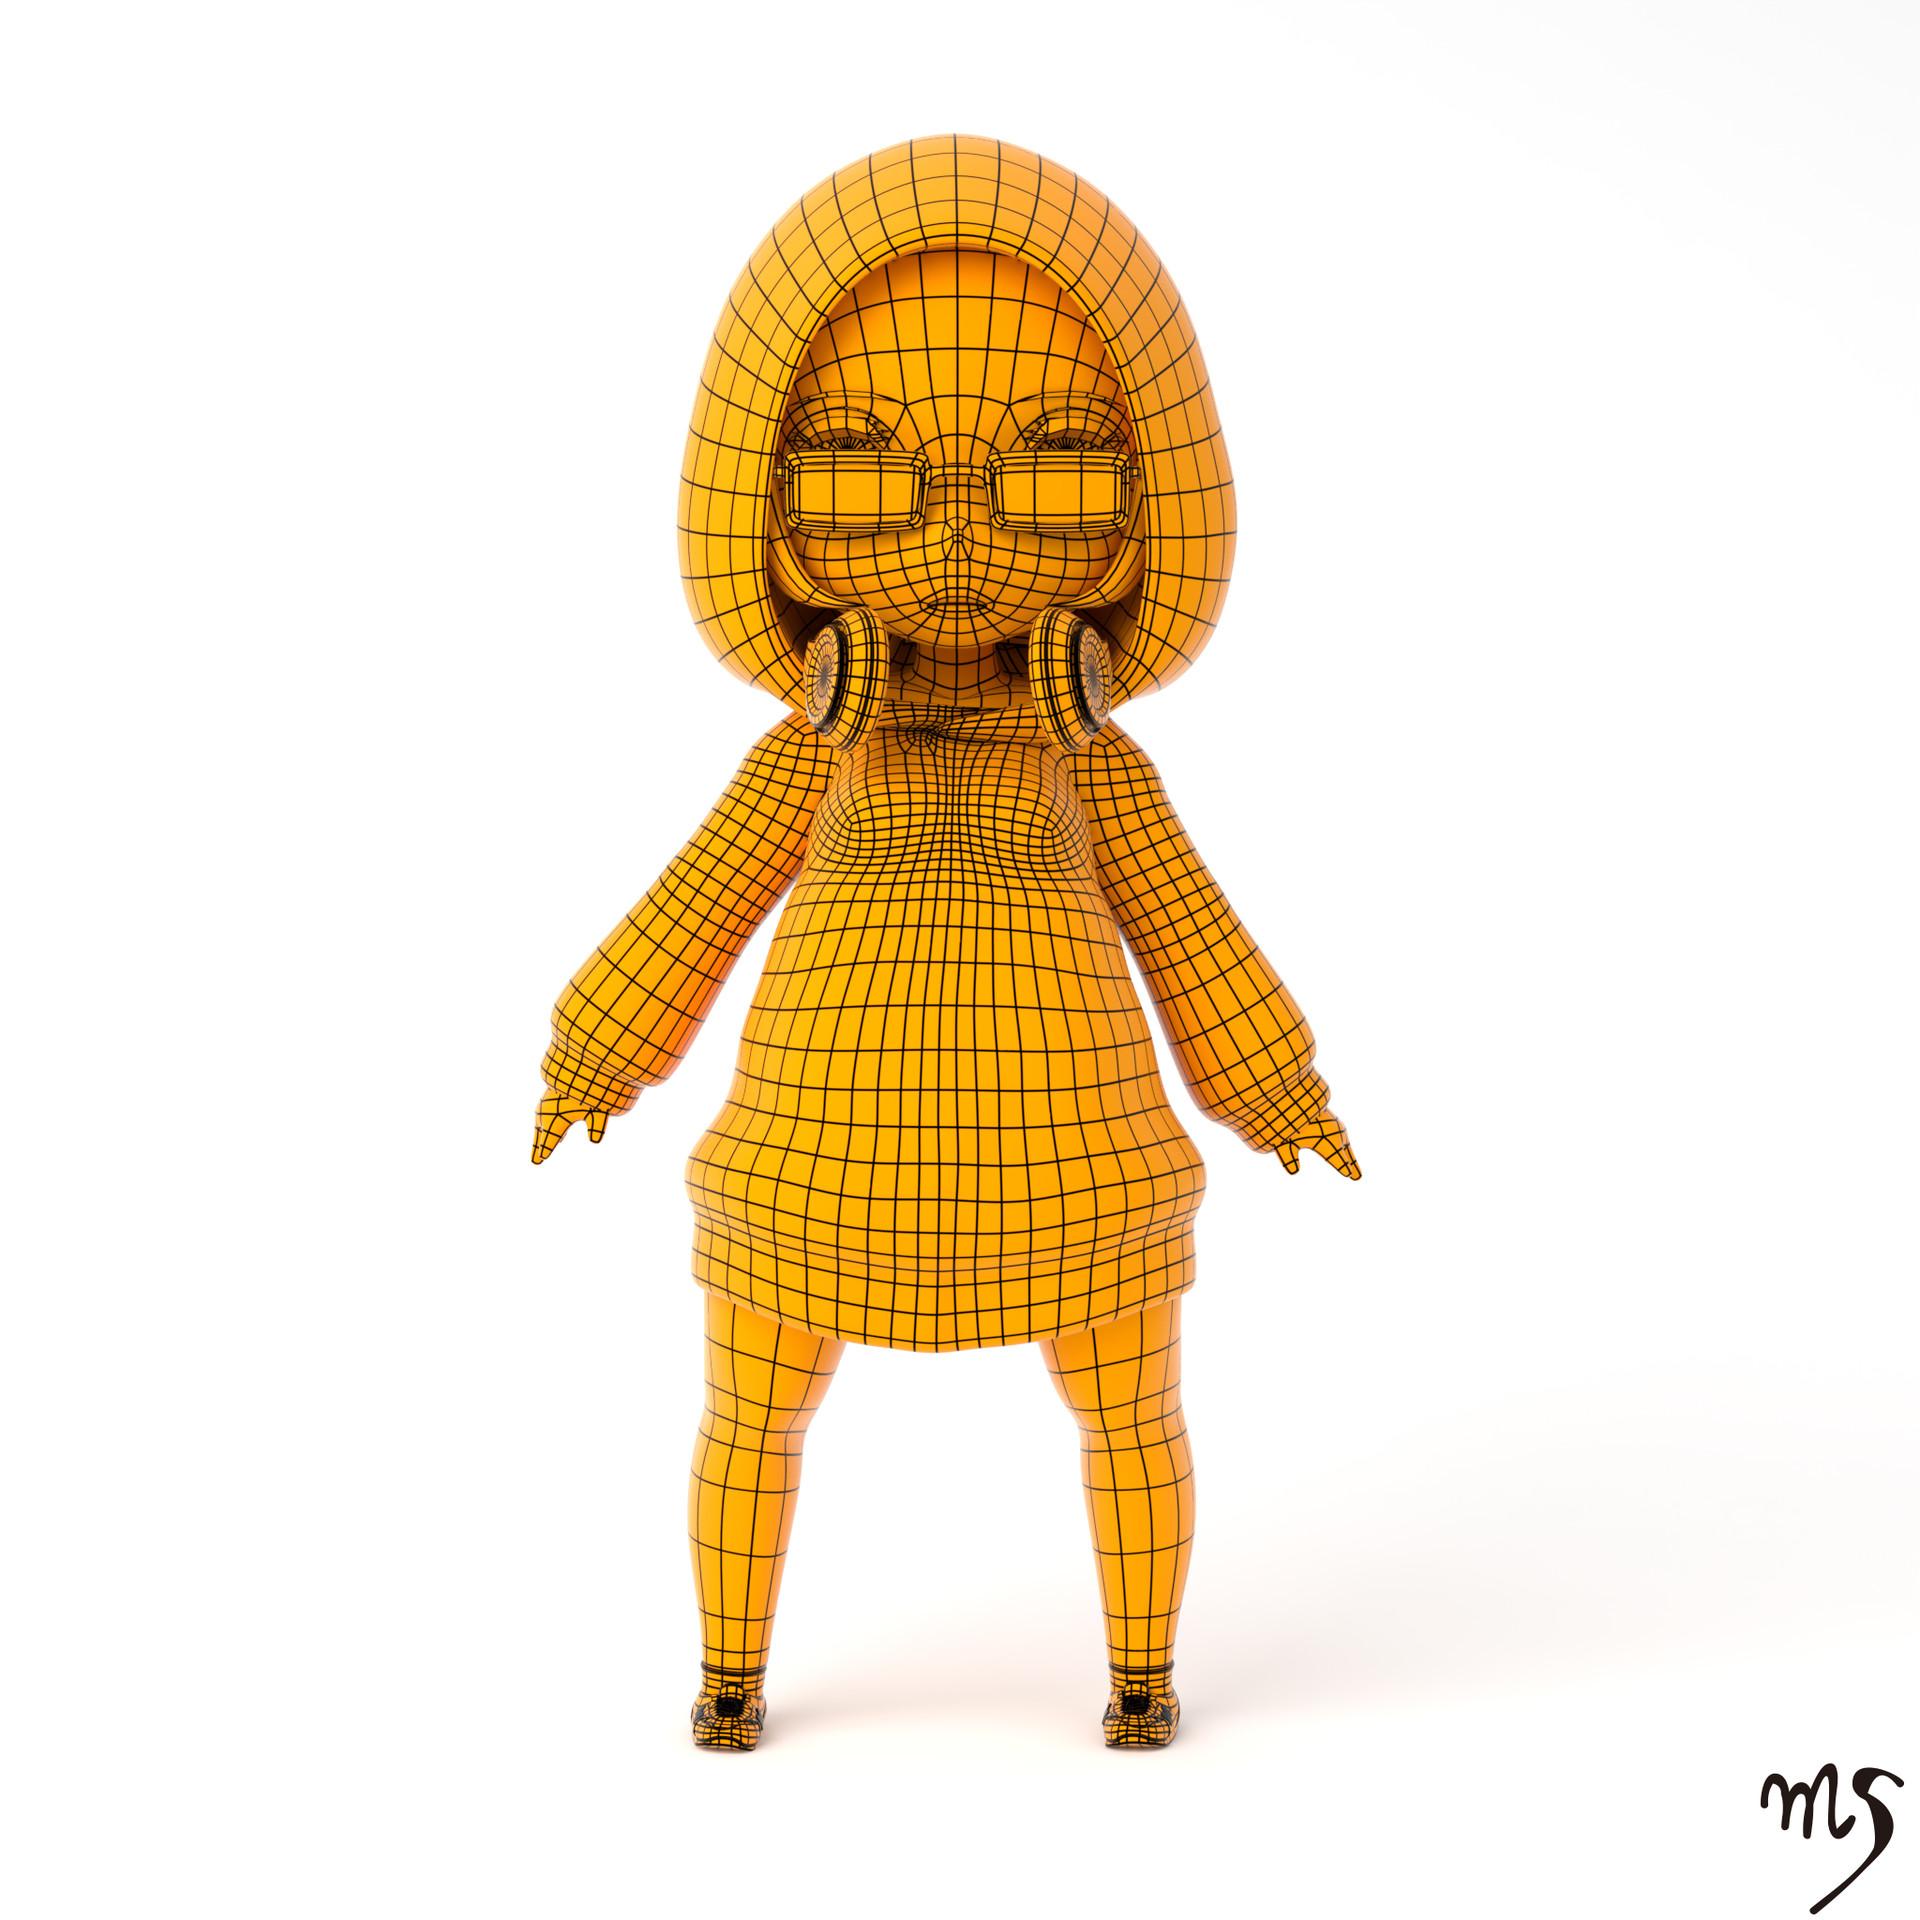 Masatomo suzuki hoodedgirl wireframe